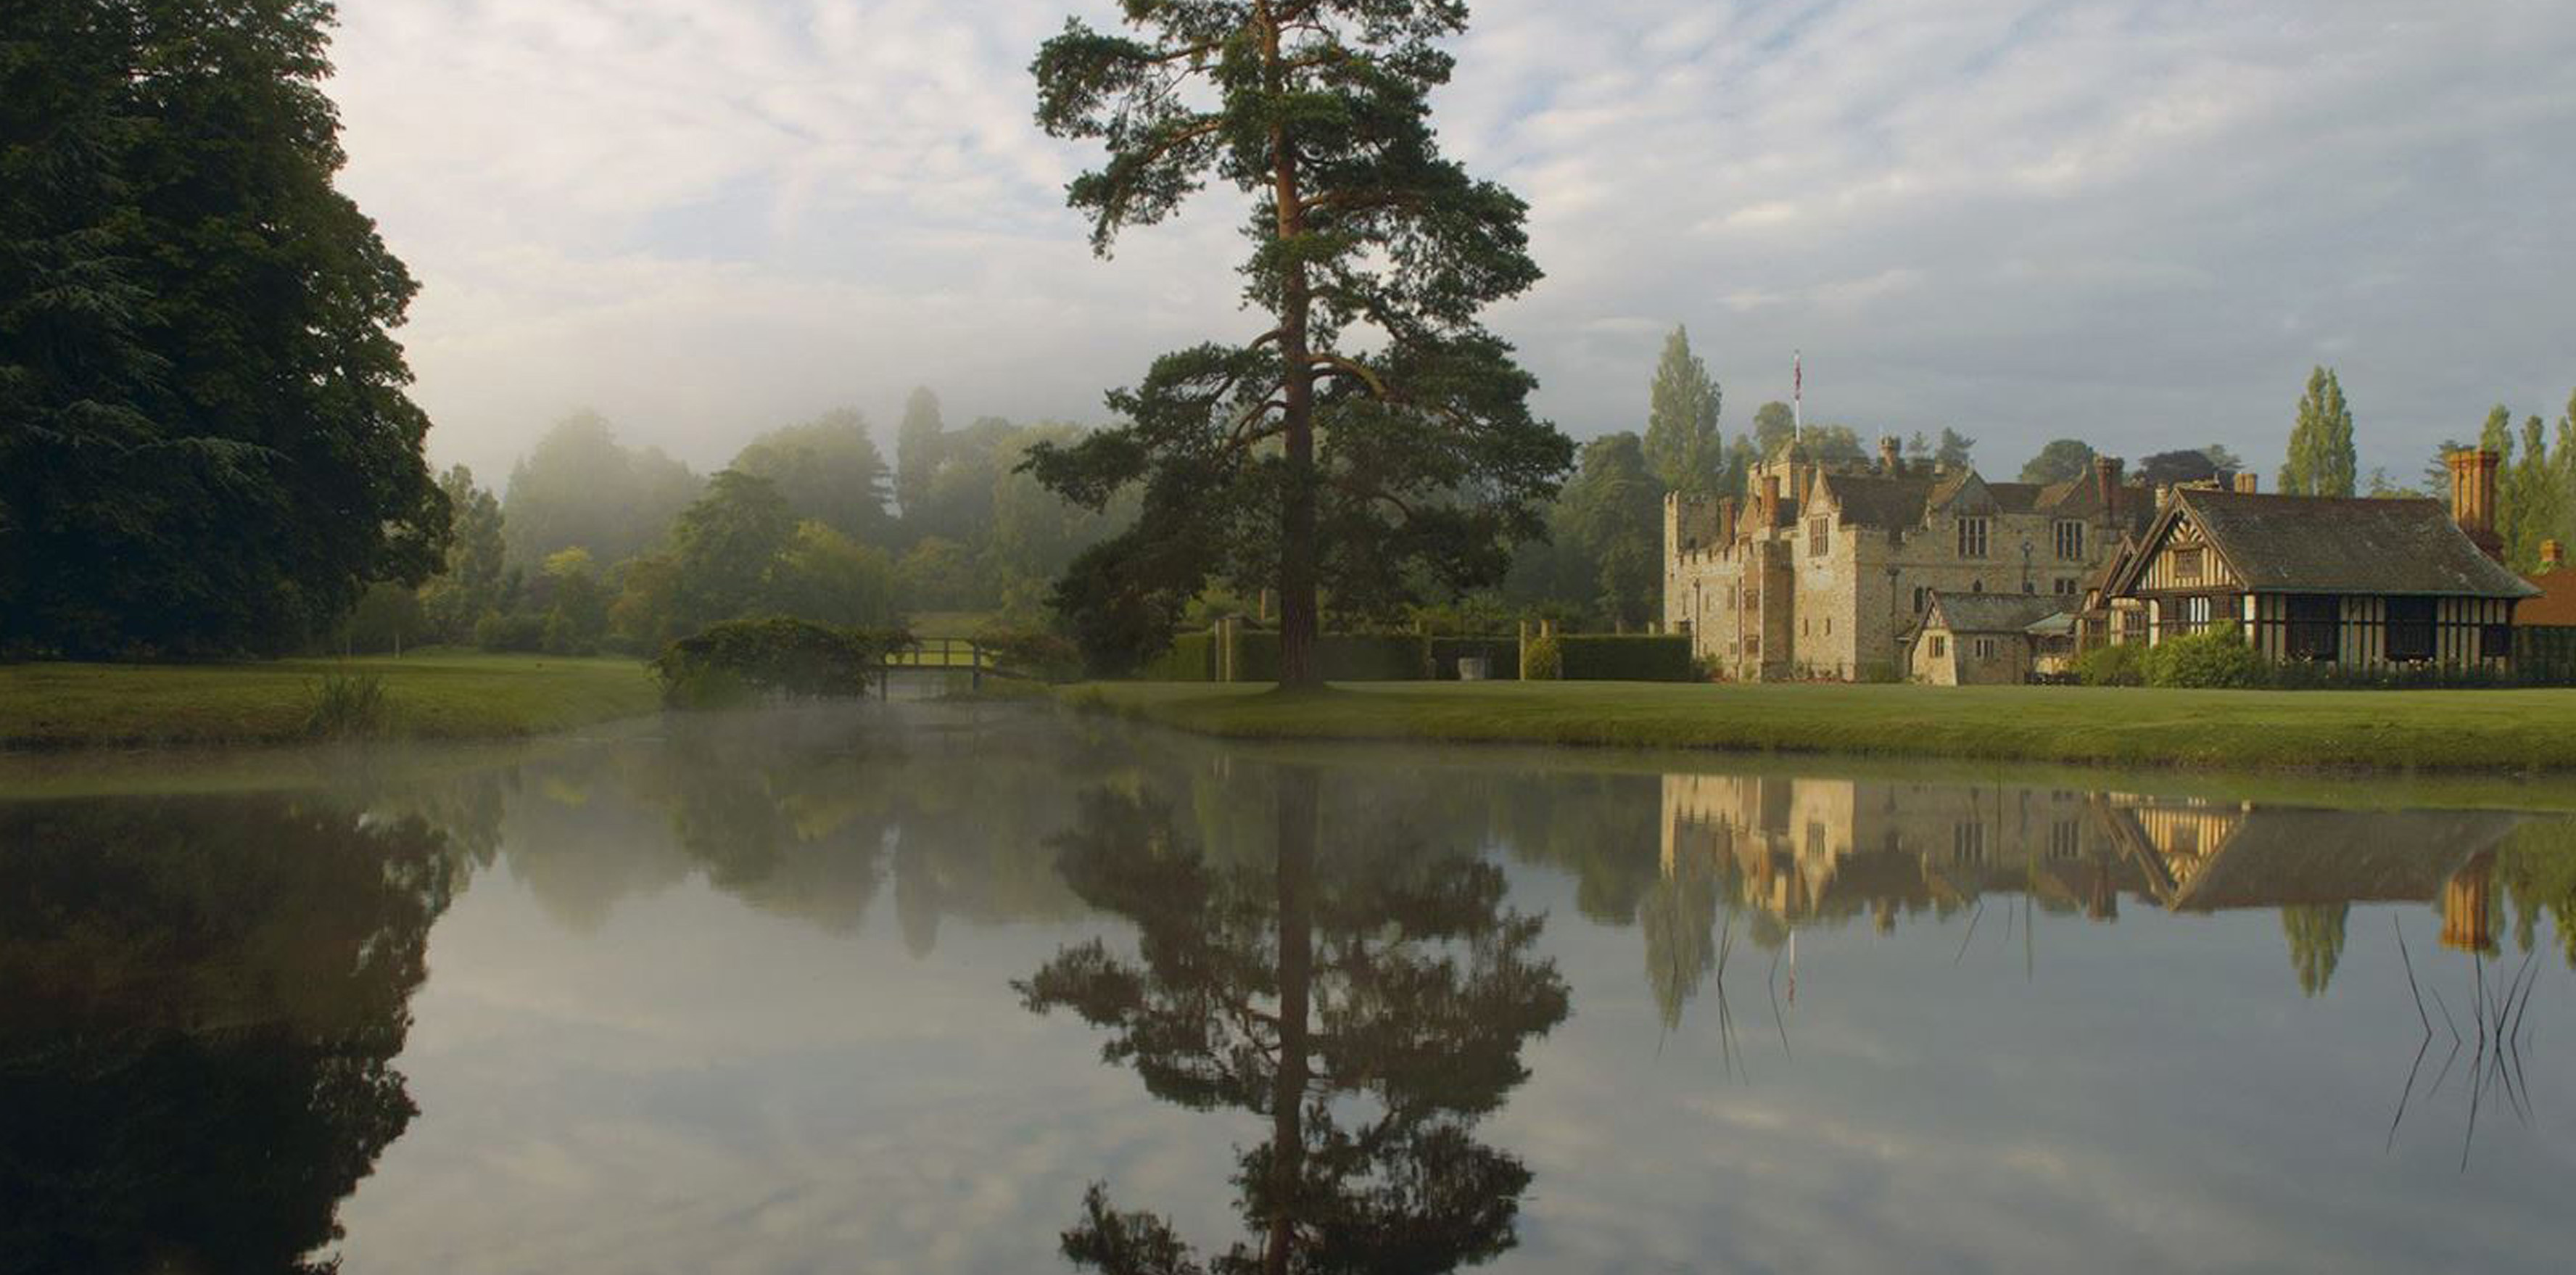 Heaver Castle - photo by David Hodgkinson